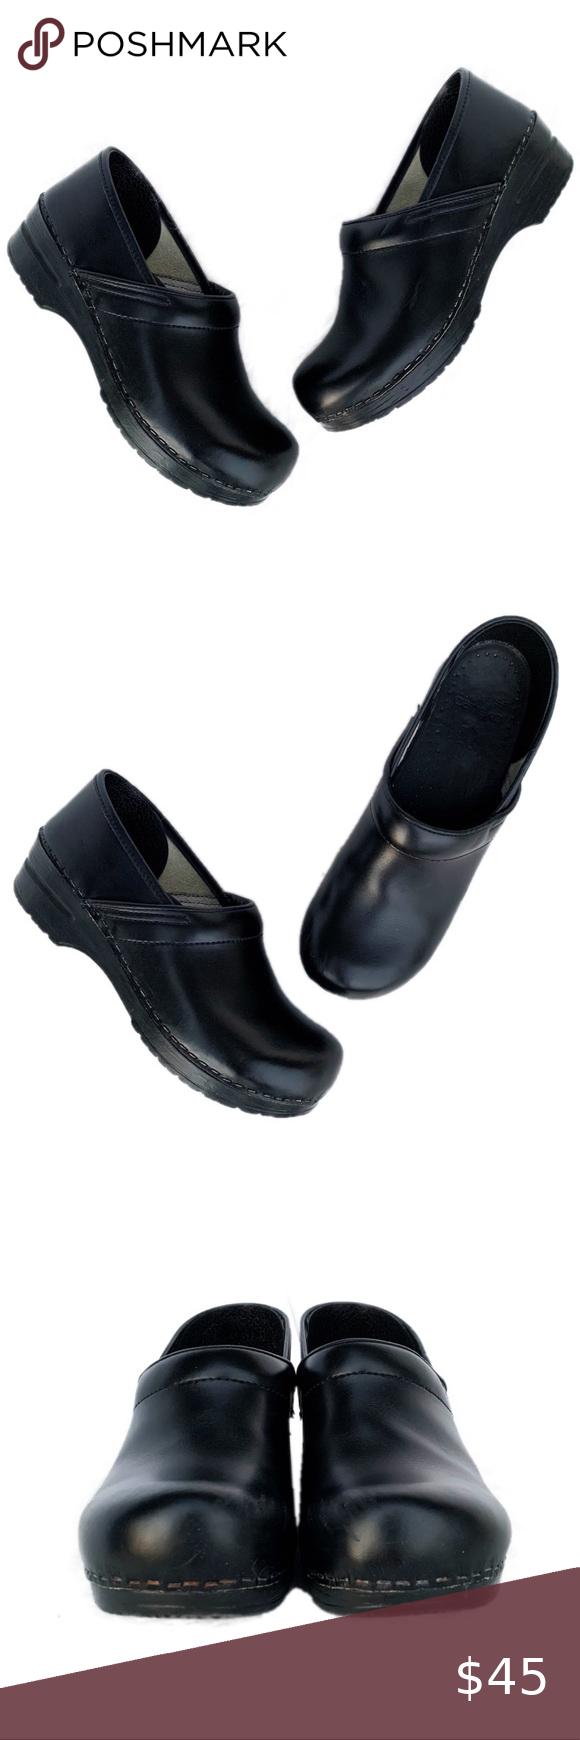 DANSKO Black Leather Non Slip Nurse